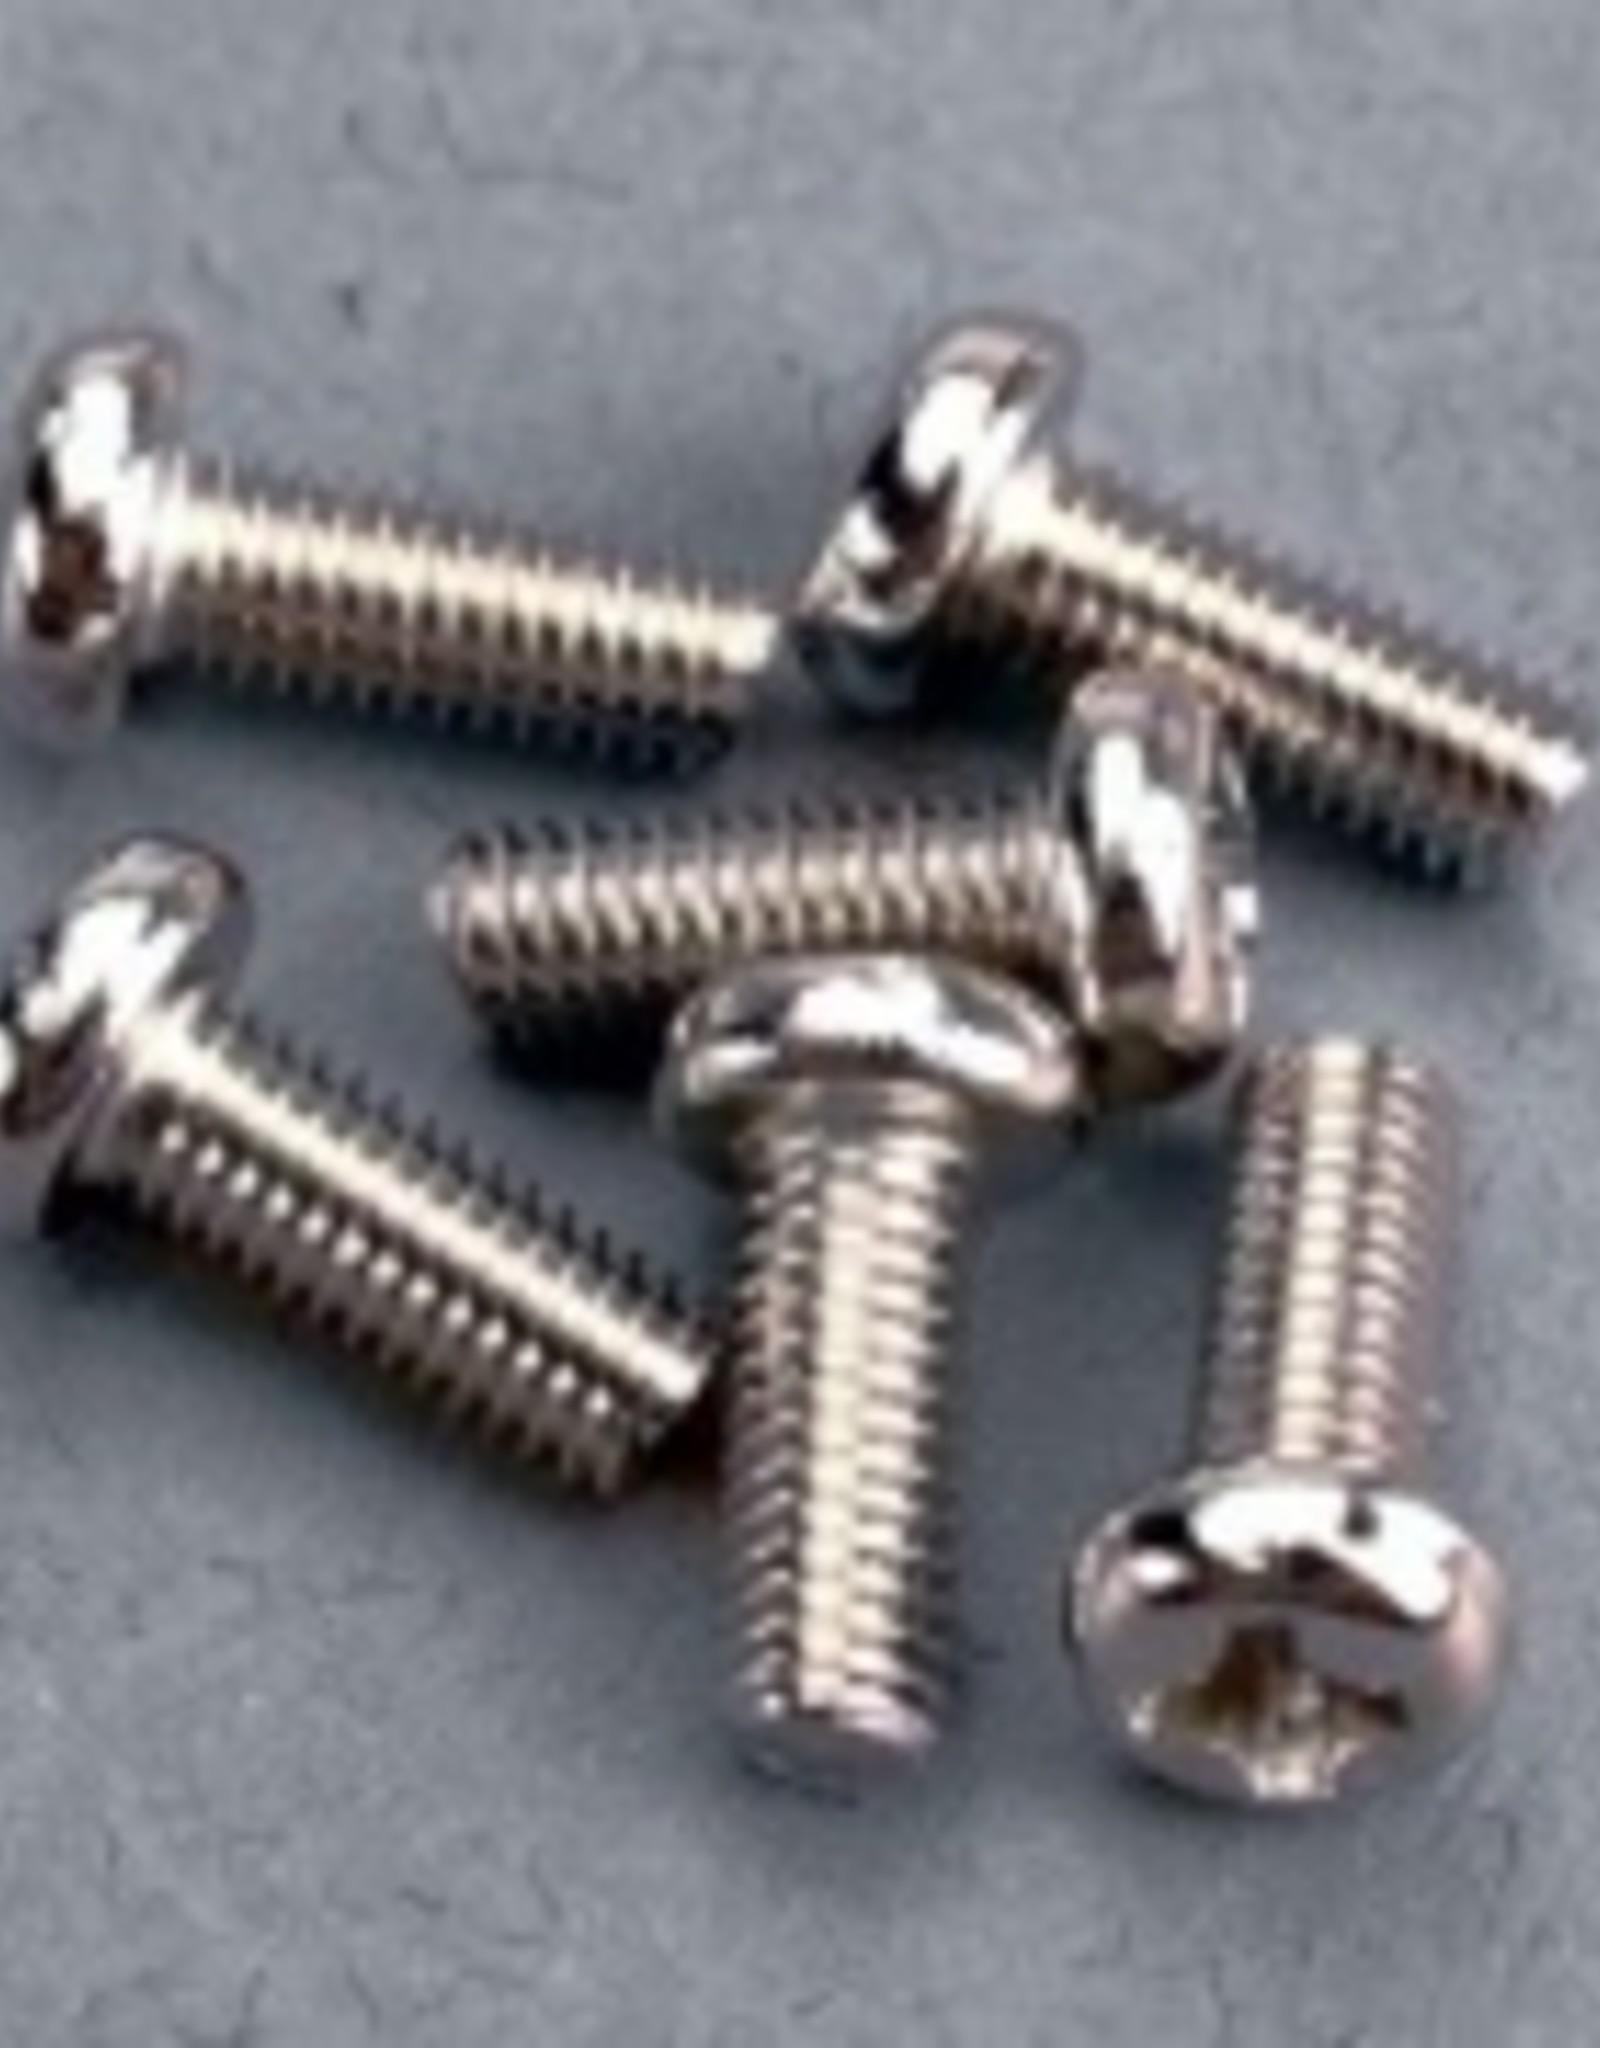 Traxxas Traxxas Screws,3x8mm Roundhead,Machine